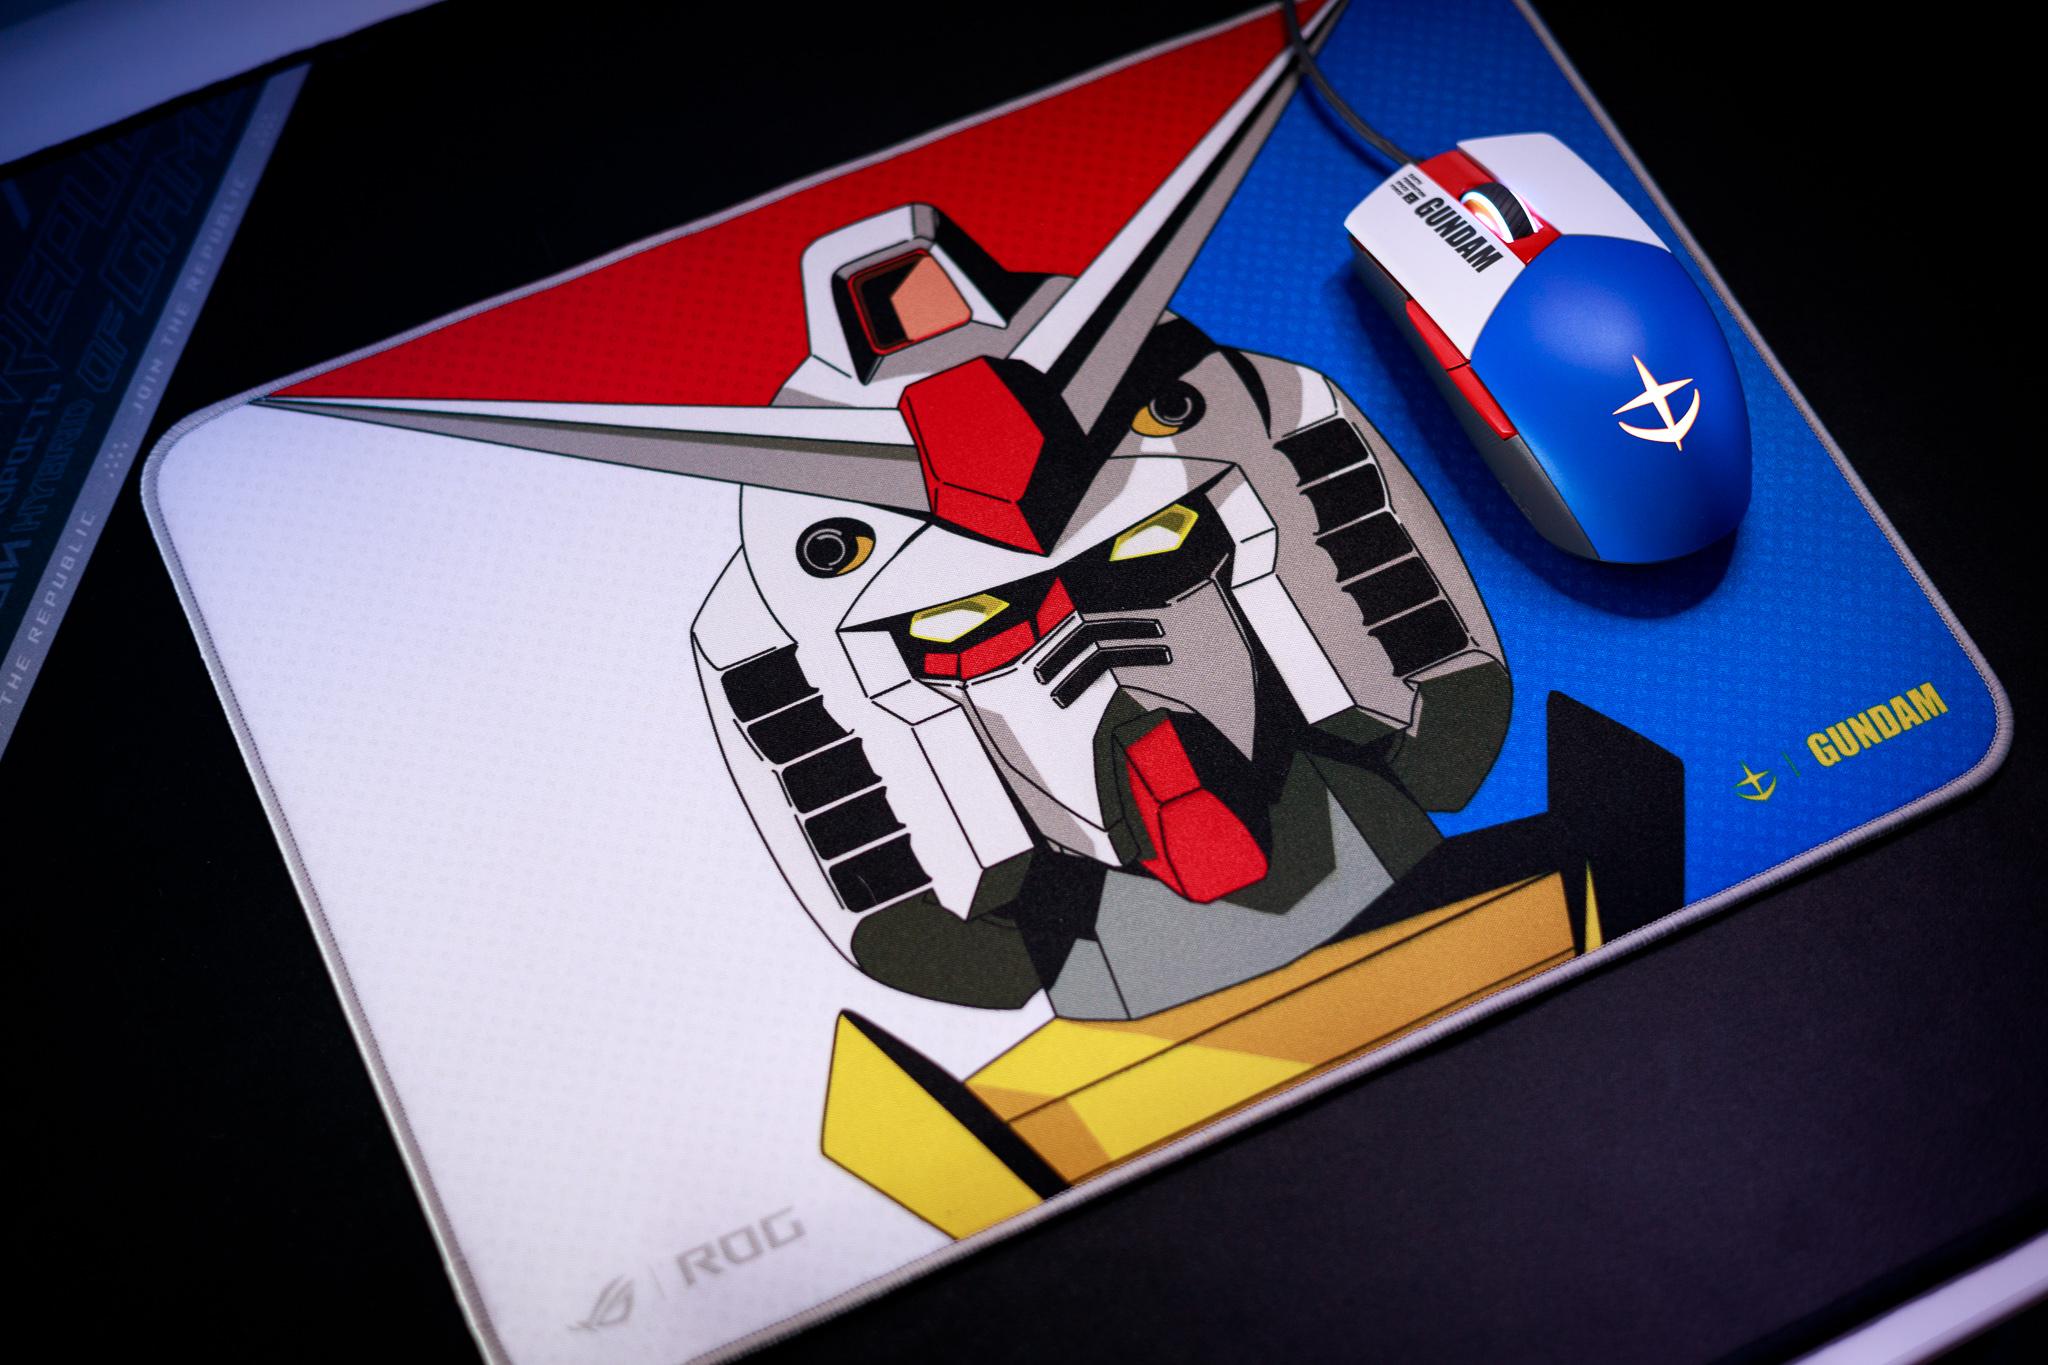 ASUS x Gundam_02